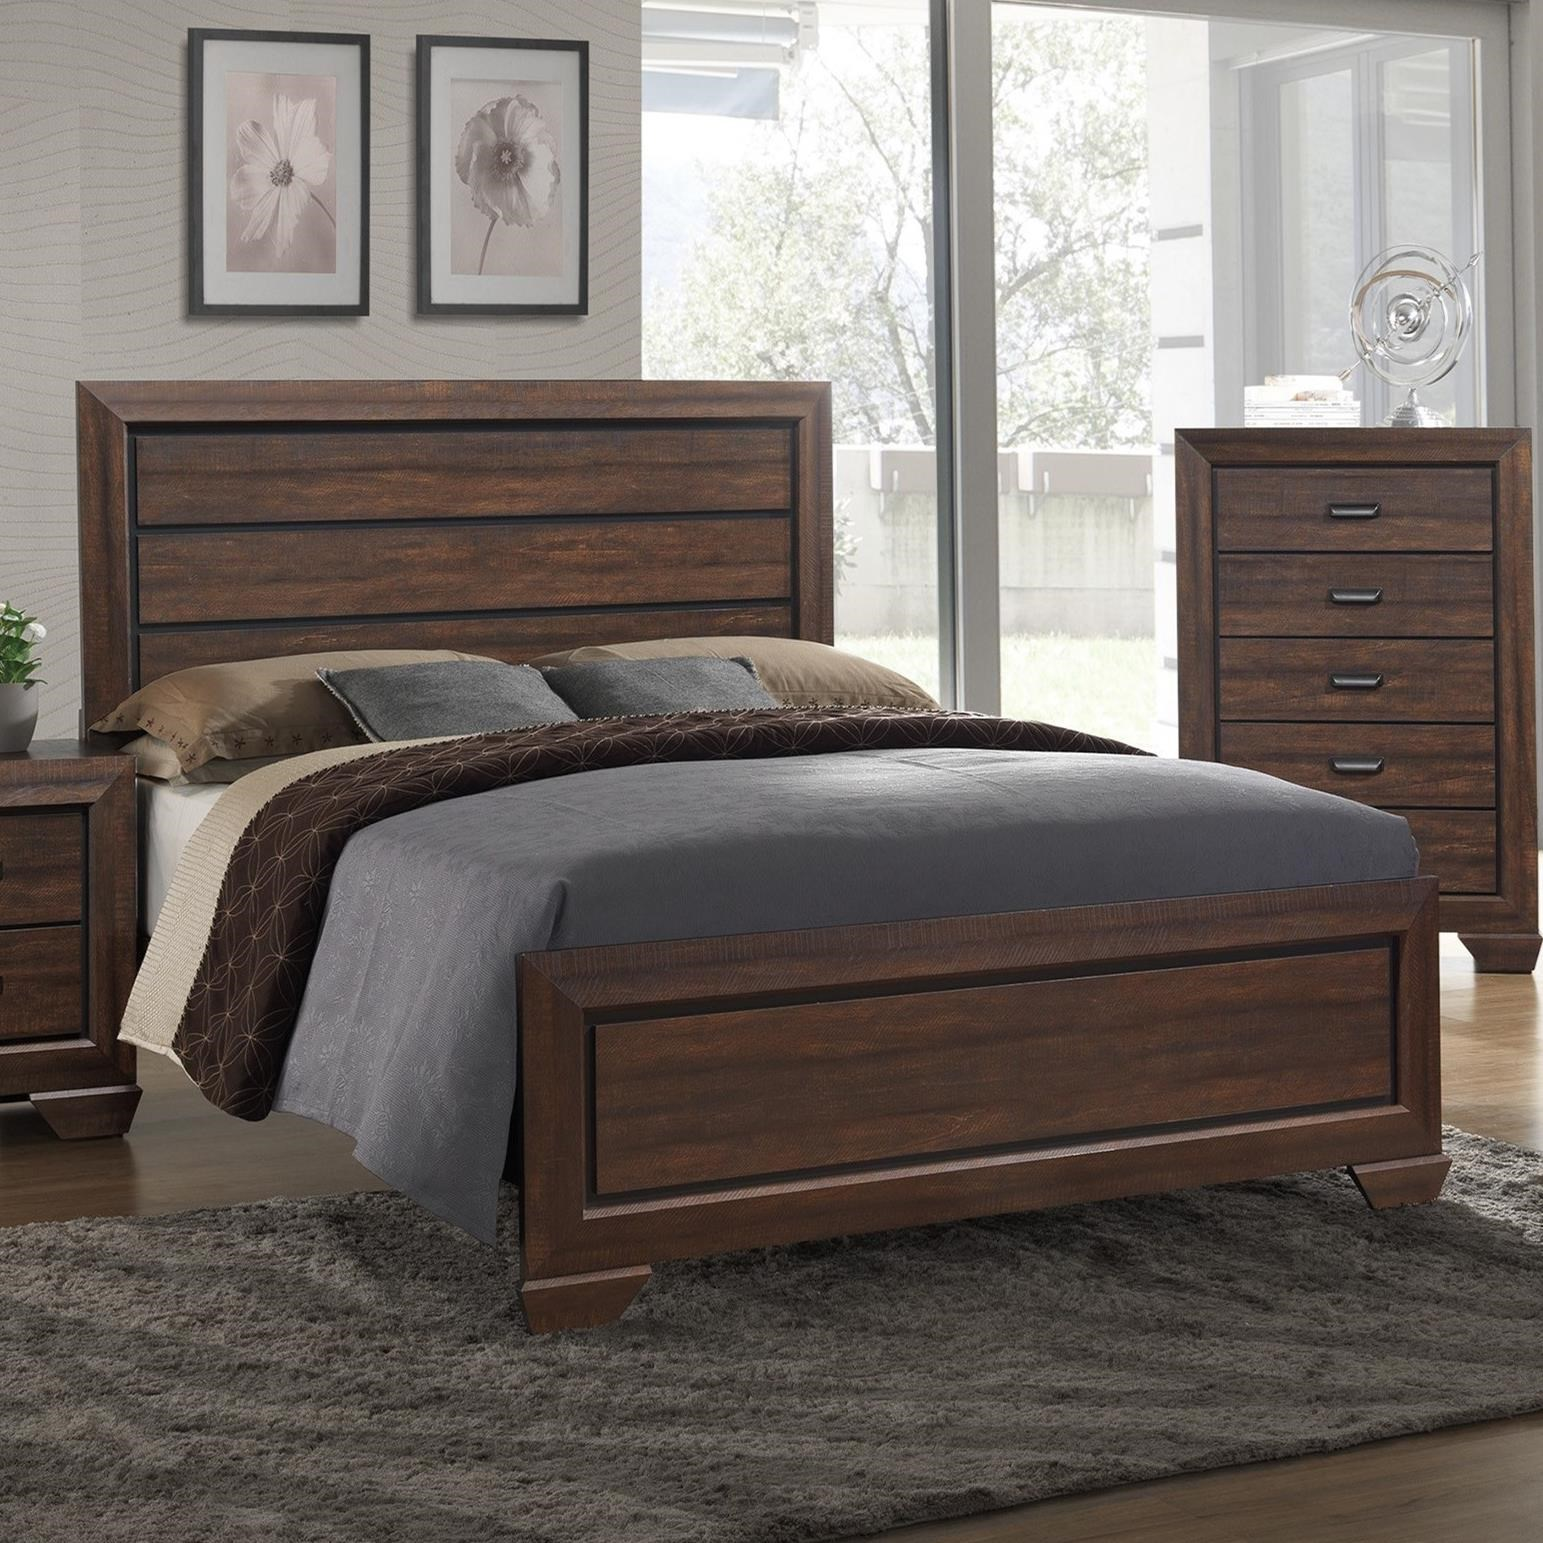 Crown Mark Farrow Queen Bedroom Group: Crown Mark Farrow Twin Headboard And Footboard Panel Bed